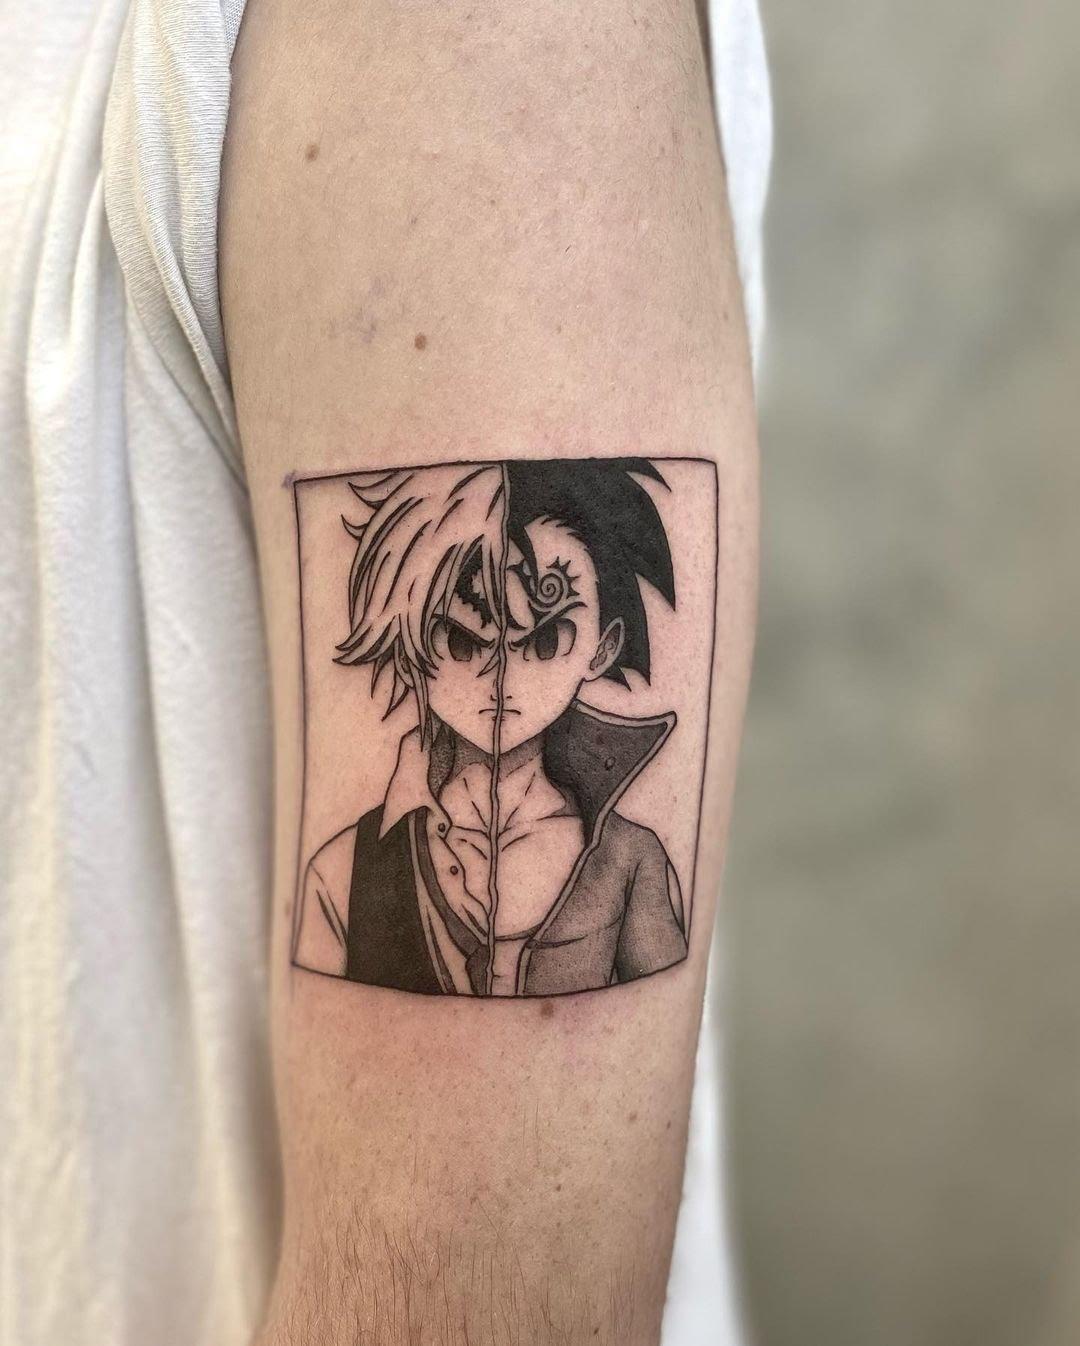 Tendances tatouages 2021 : Le tatouage en hommage au manga